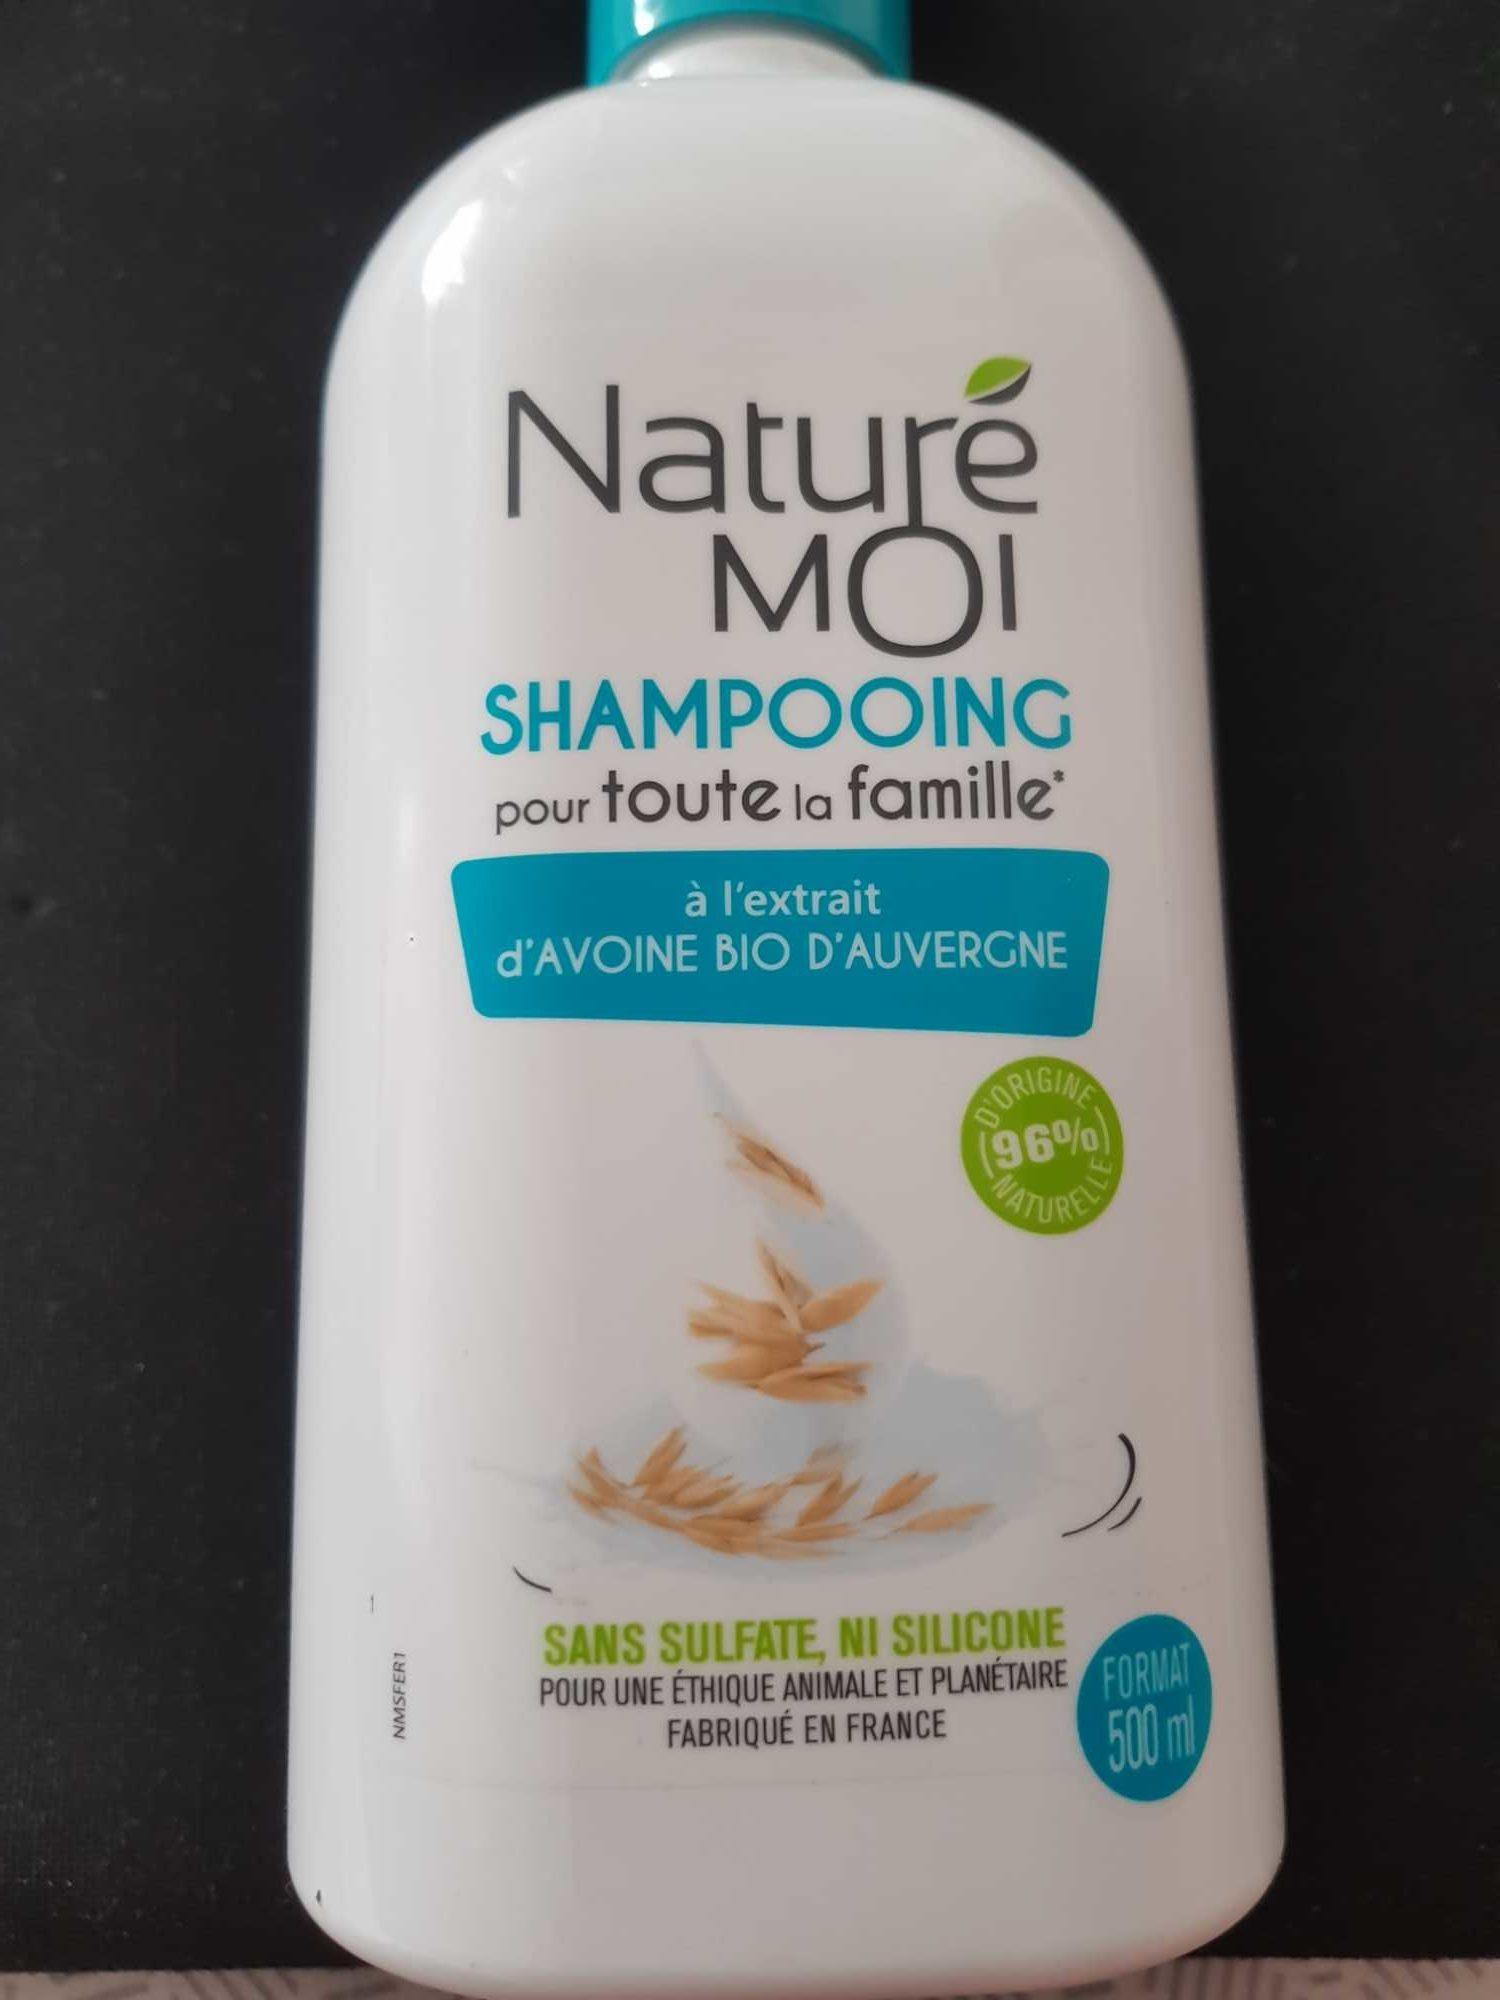 Naturé moi shampooing - Product - fr